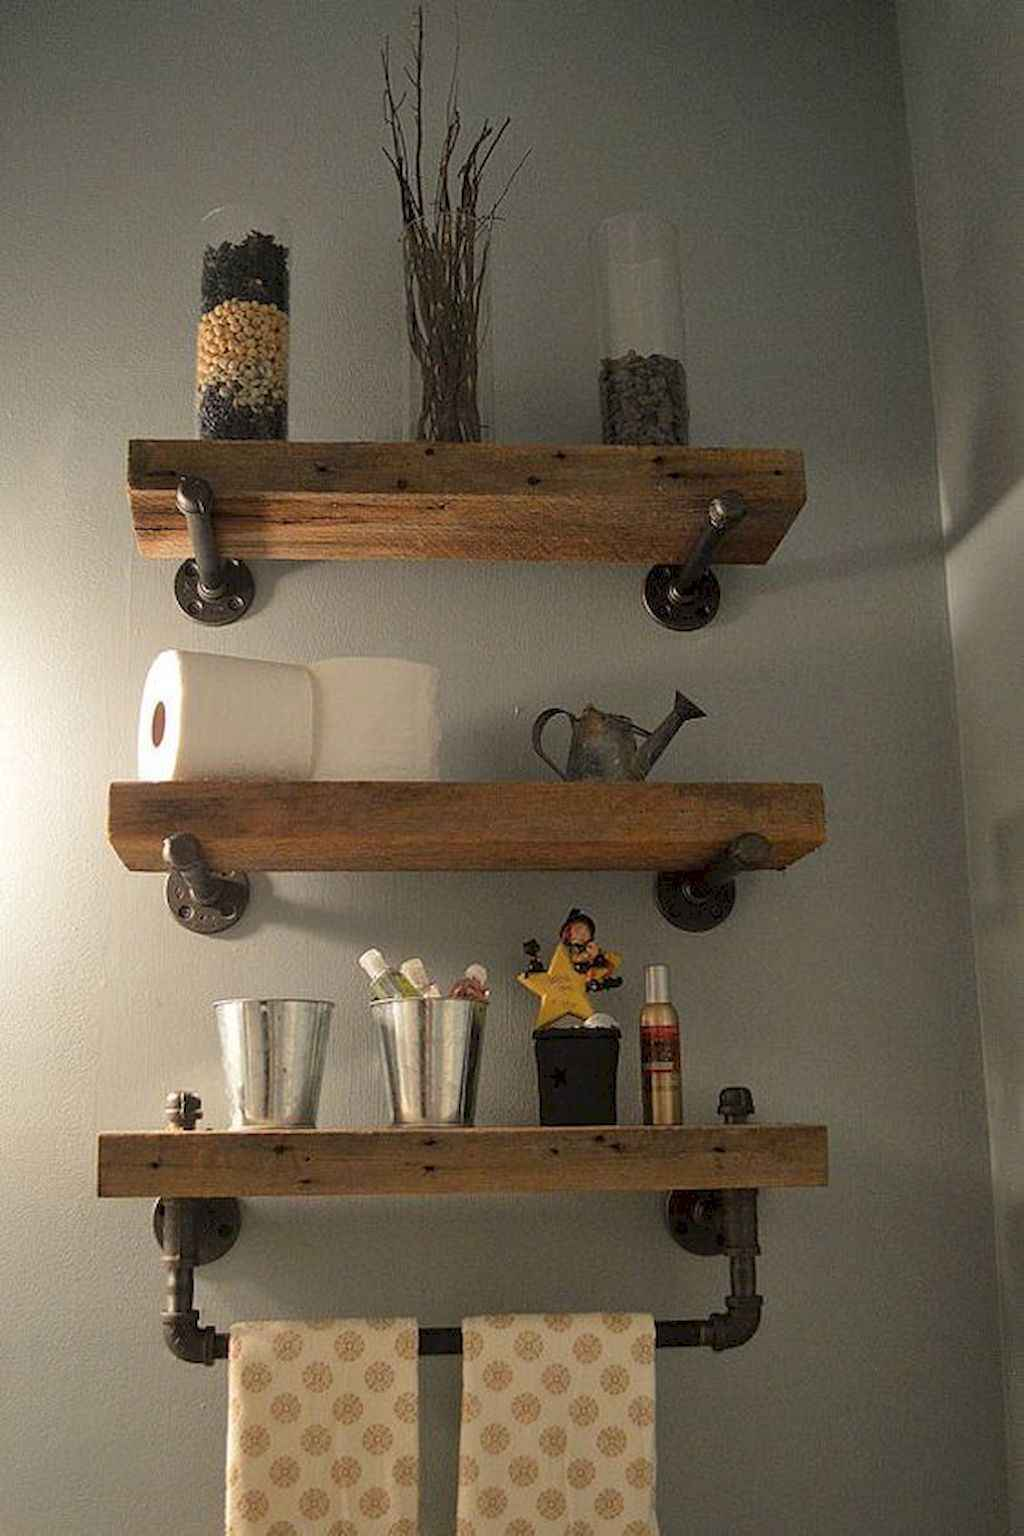 Cool bathroom storage shelves organization ideas (35)